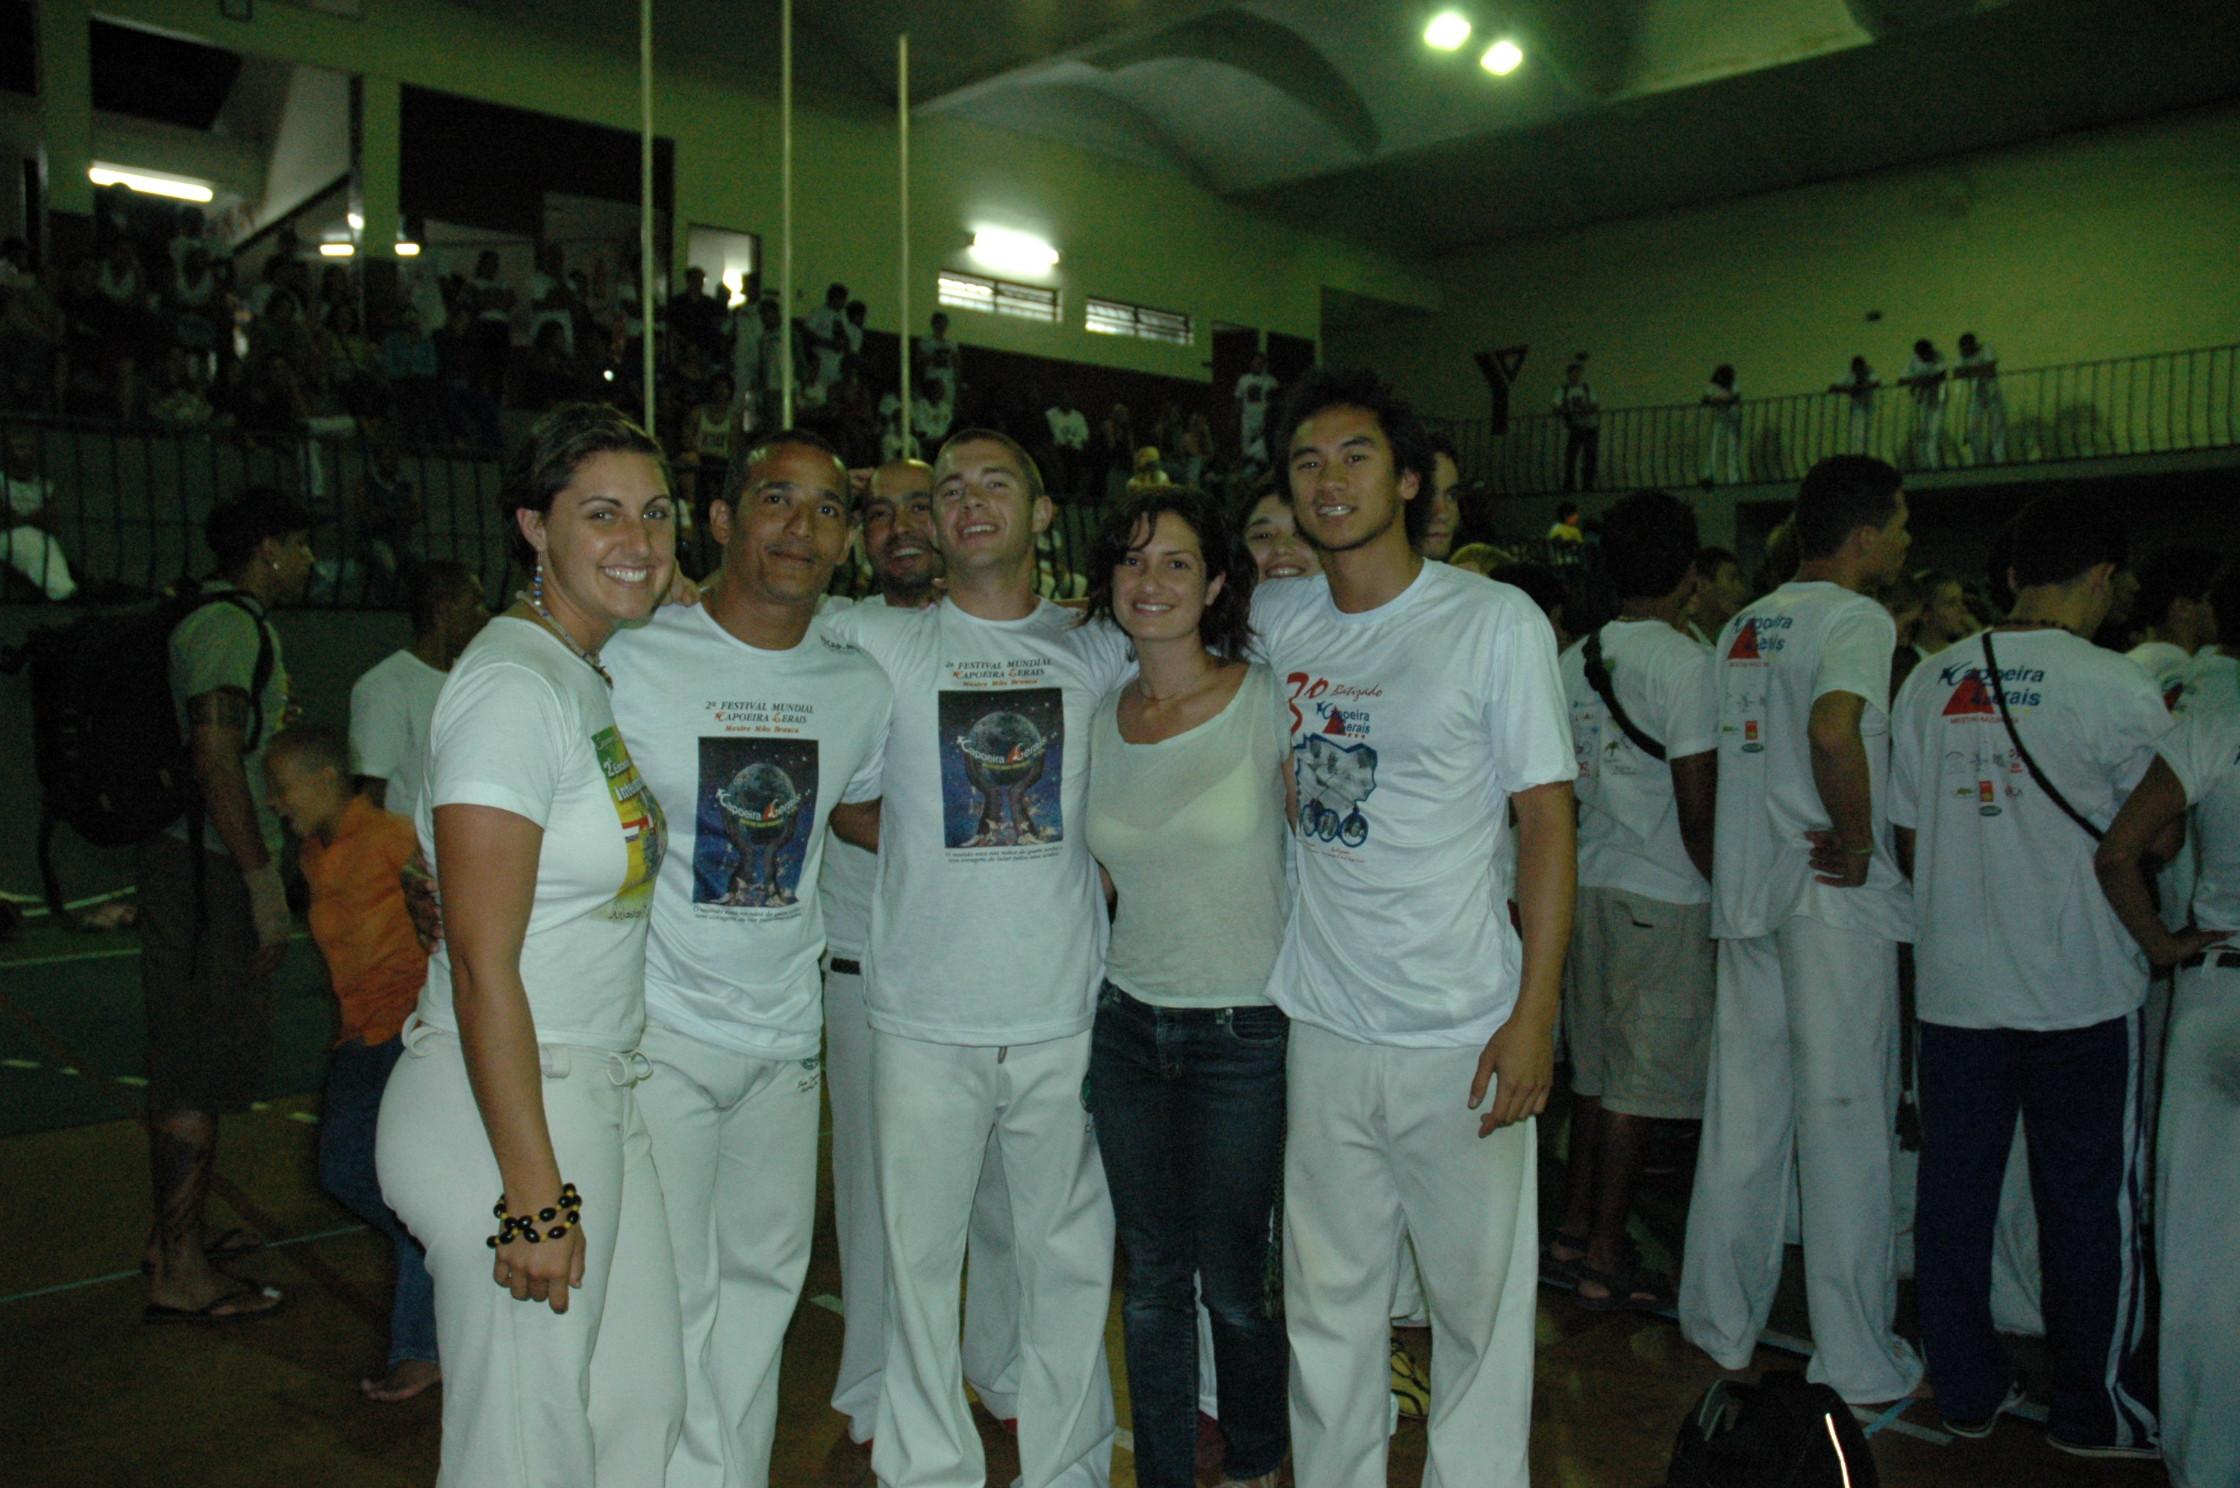 Mestre Railson-Belo Horizonte 2005